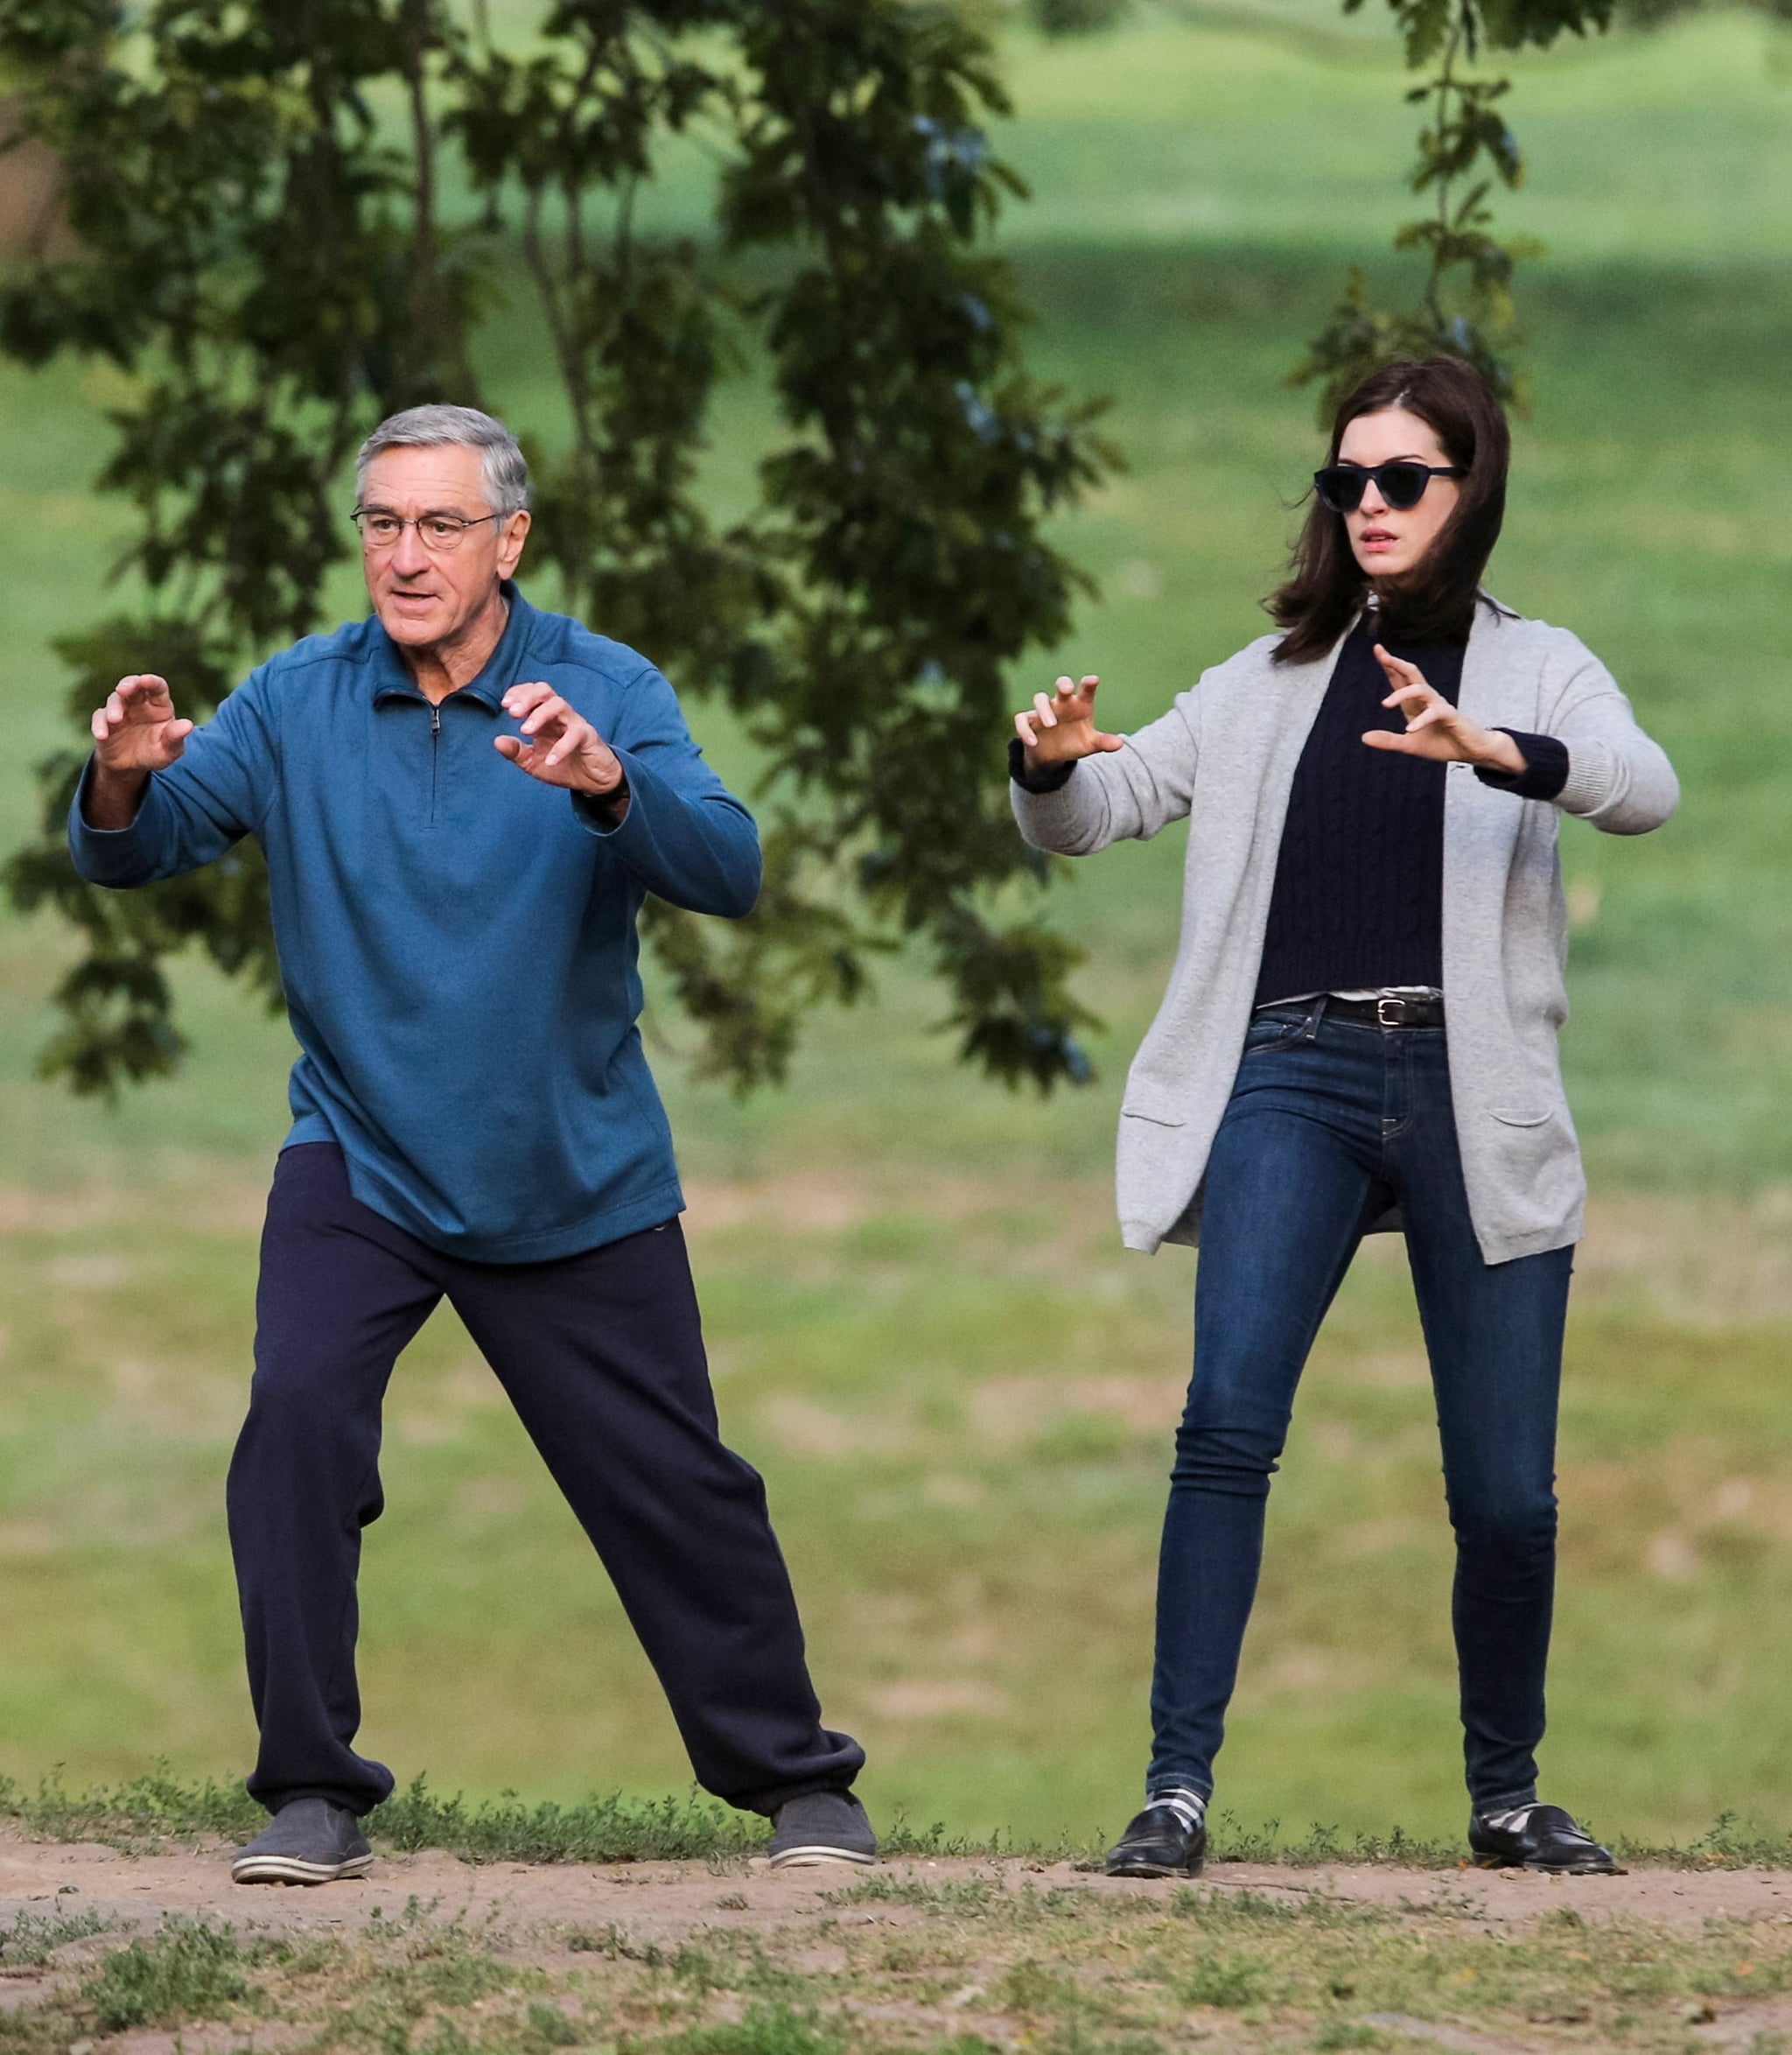 Anne Hathaway And Robert De Niro: Robert De Niro And Anne Hathaway Had Fun With Tai Chi